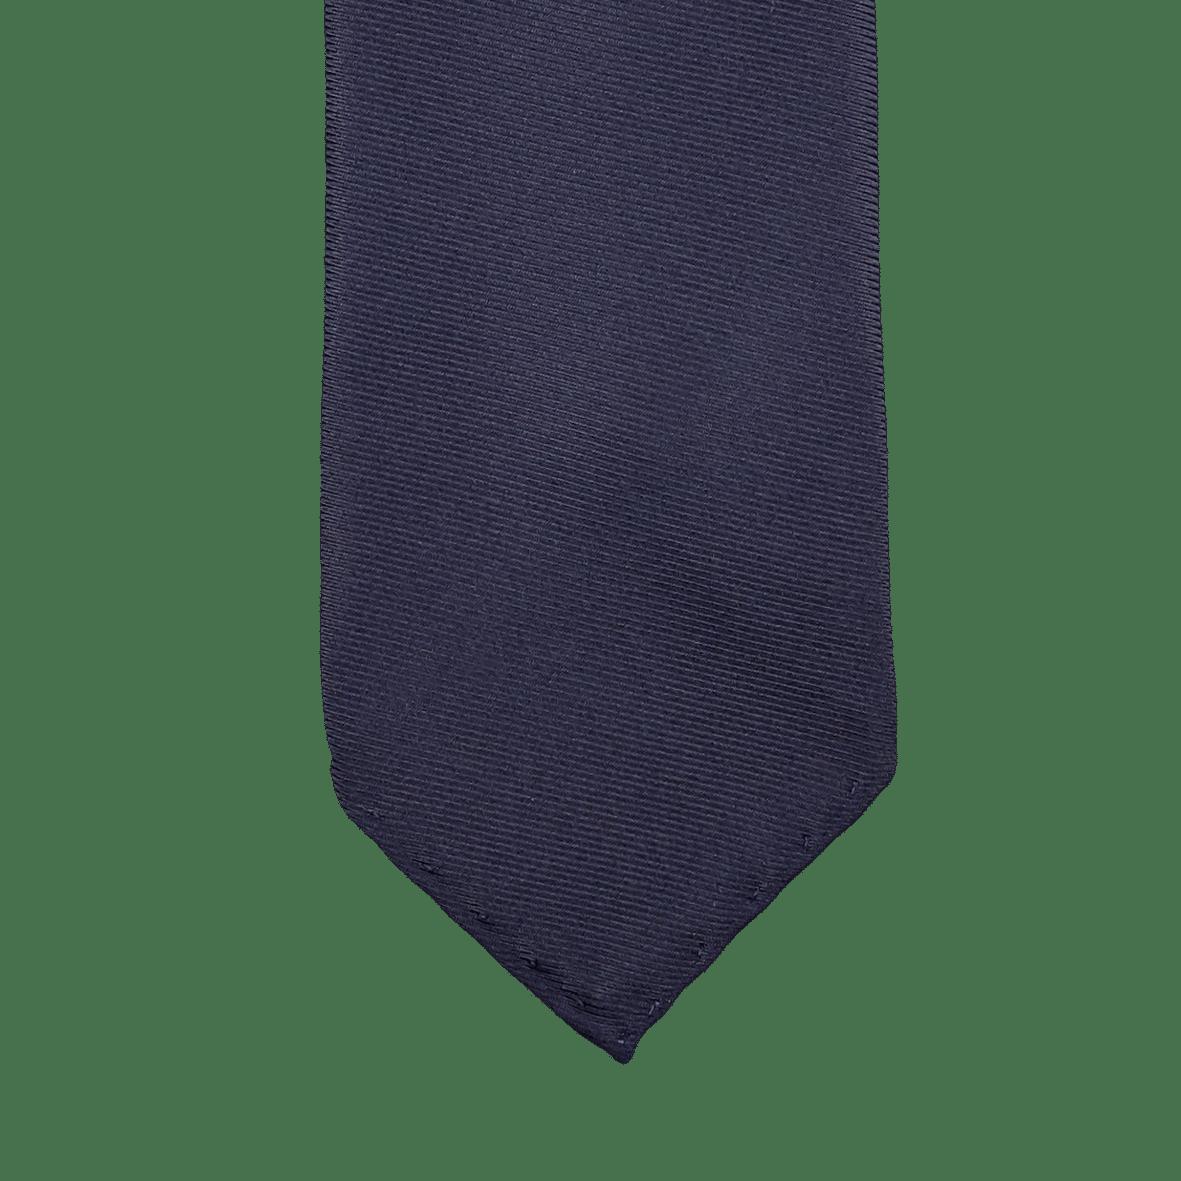 Drake's Navy Woven 50oz Foulard Silk Solid Tie Tip